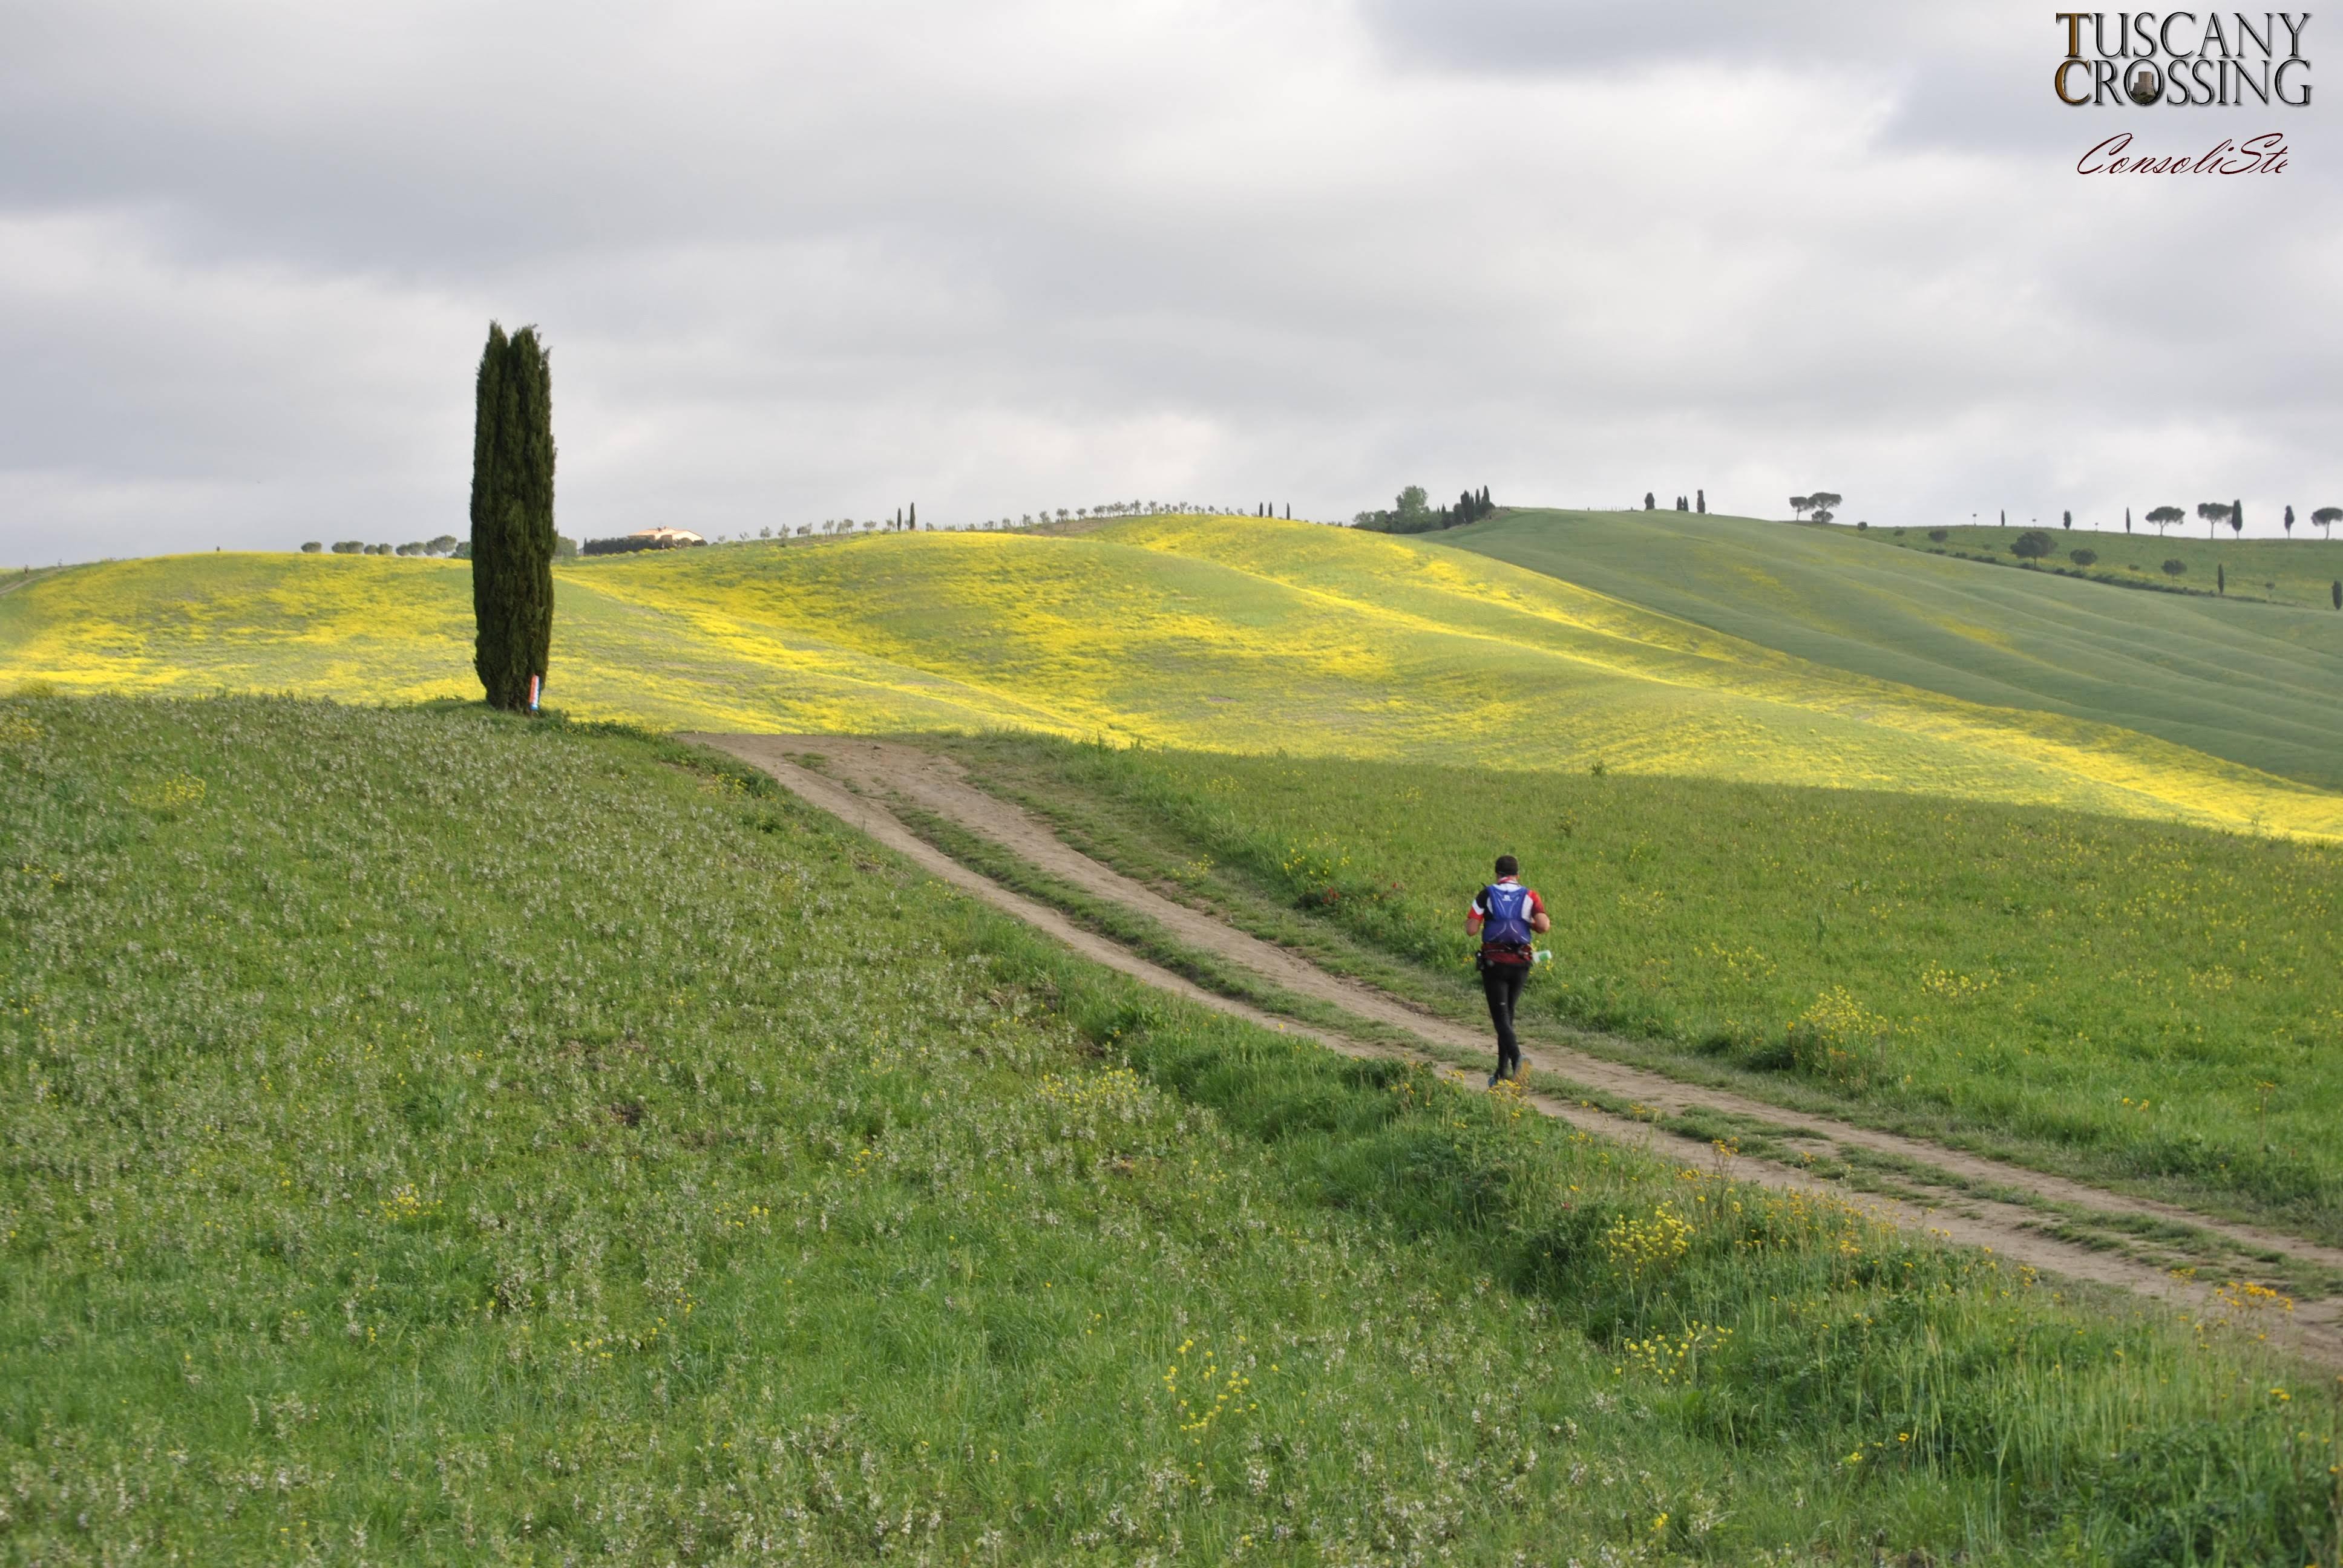 Tuscany Crossing VR